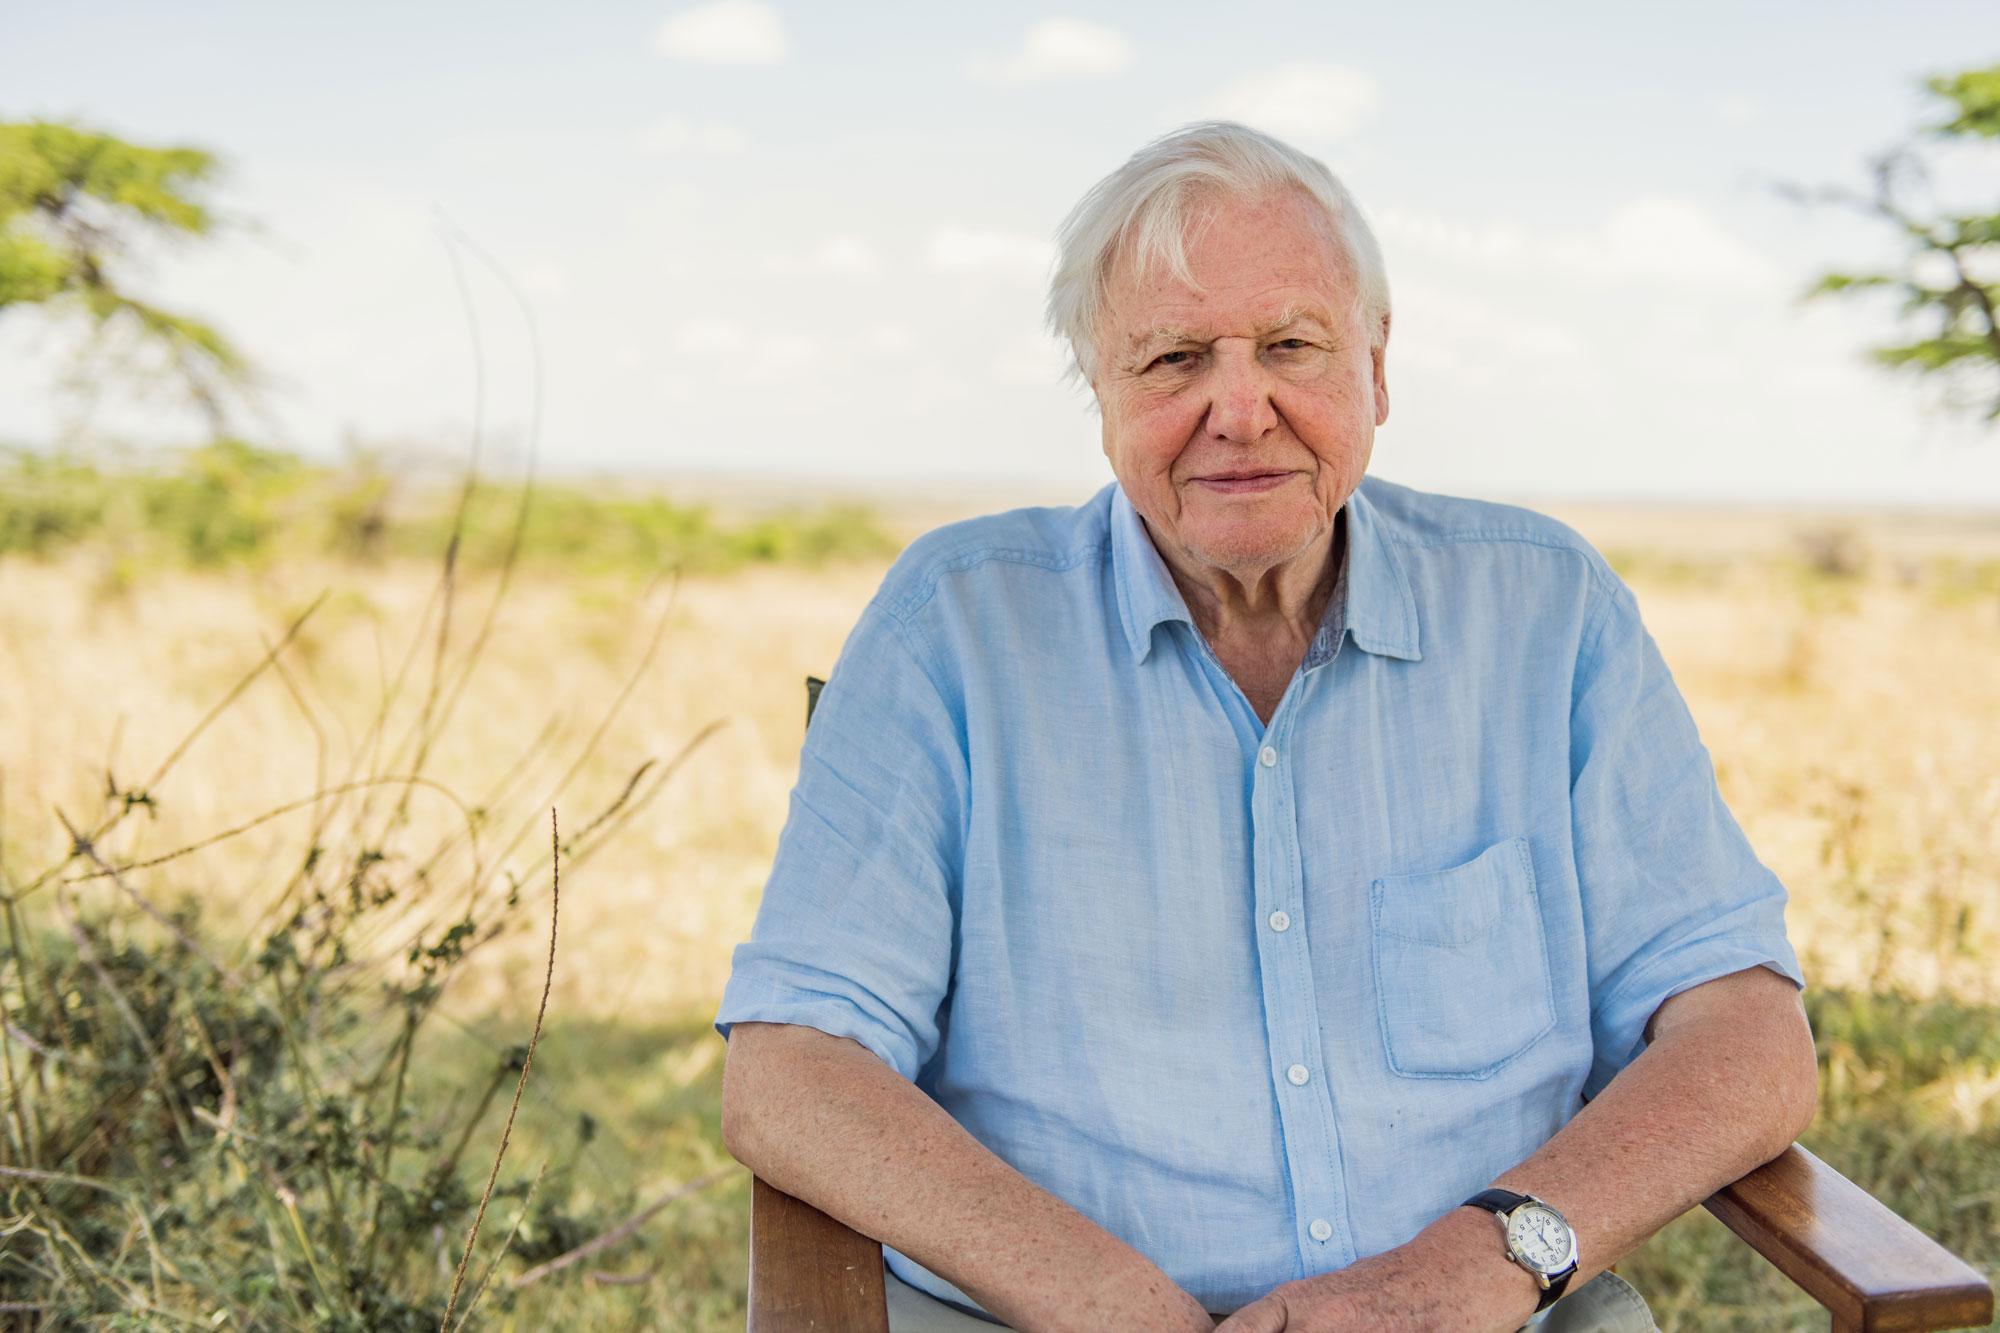 Sir David Attenborough pictured in the Maasai Mara, Kenya.